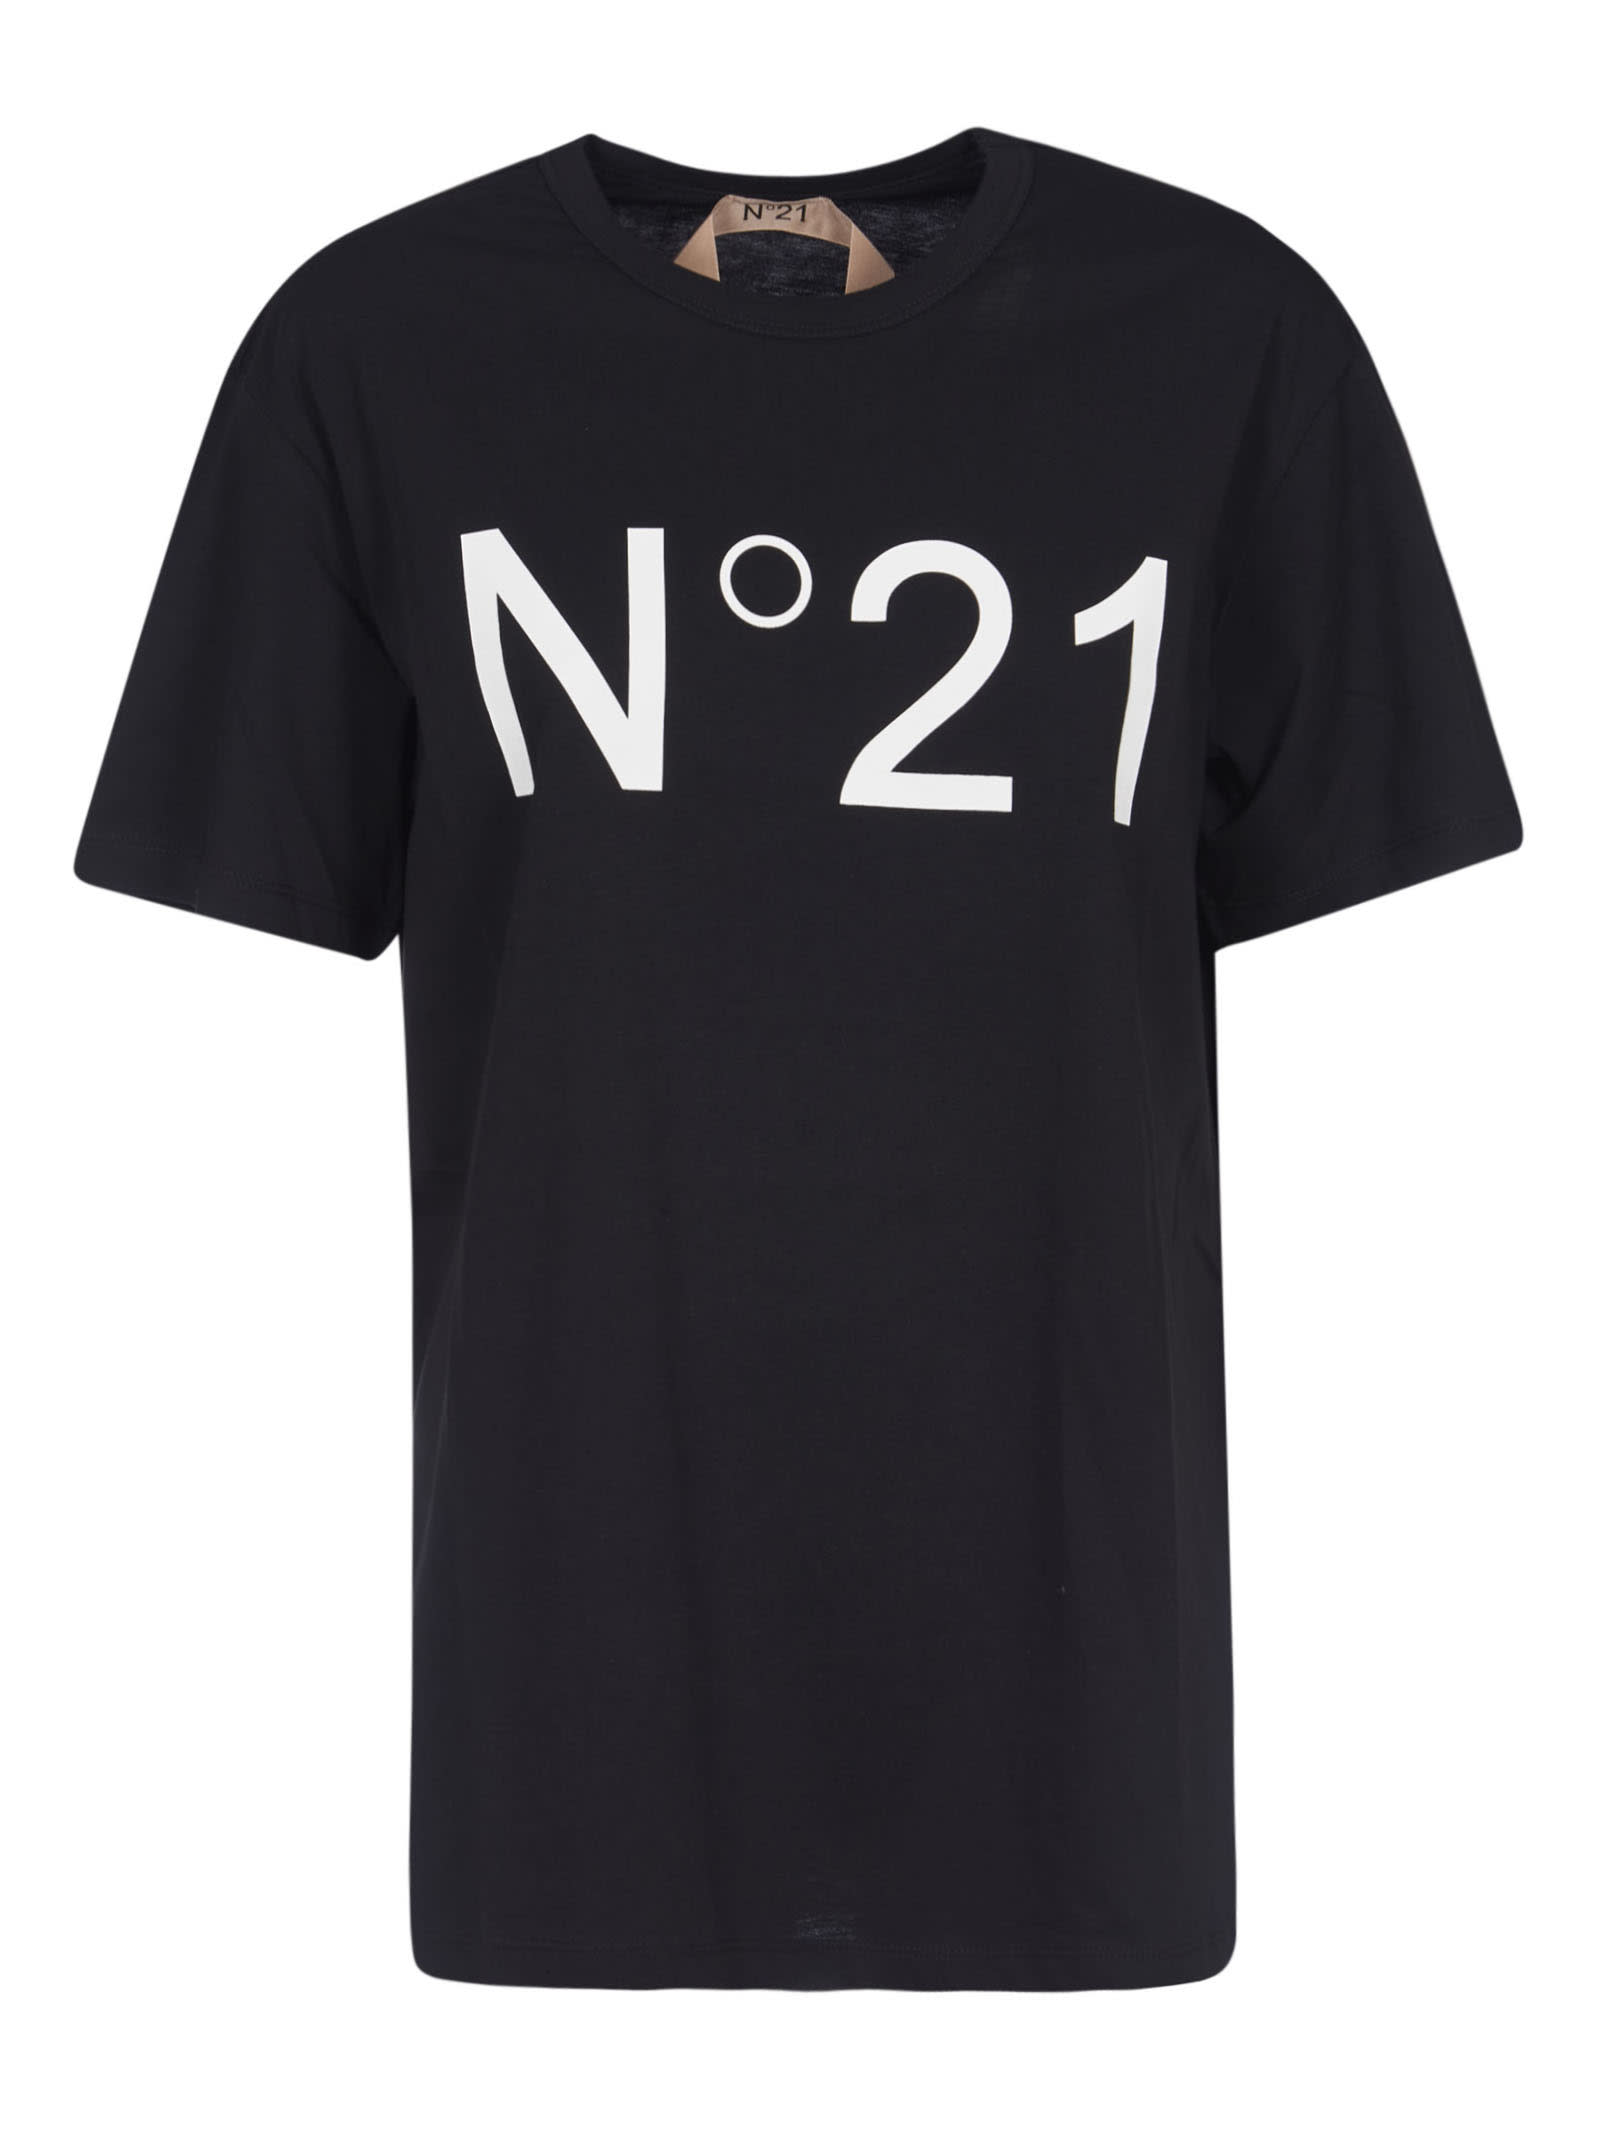 N°21 T-shirts CLASSIC LOGO T-SHIRT